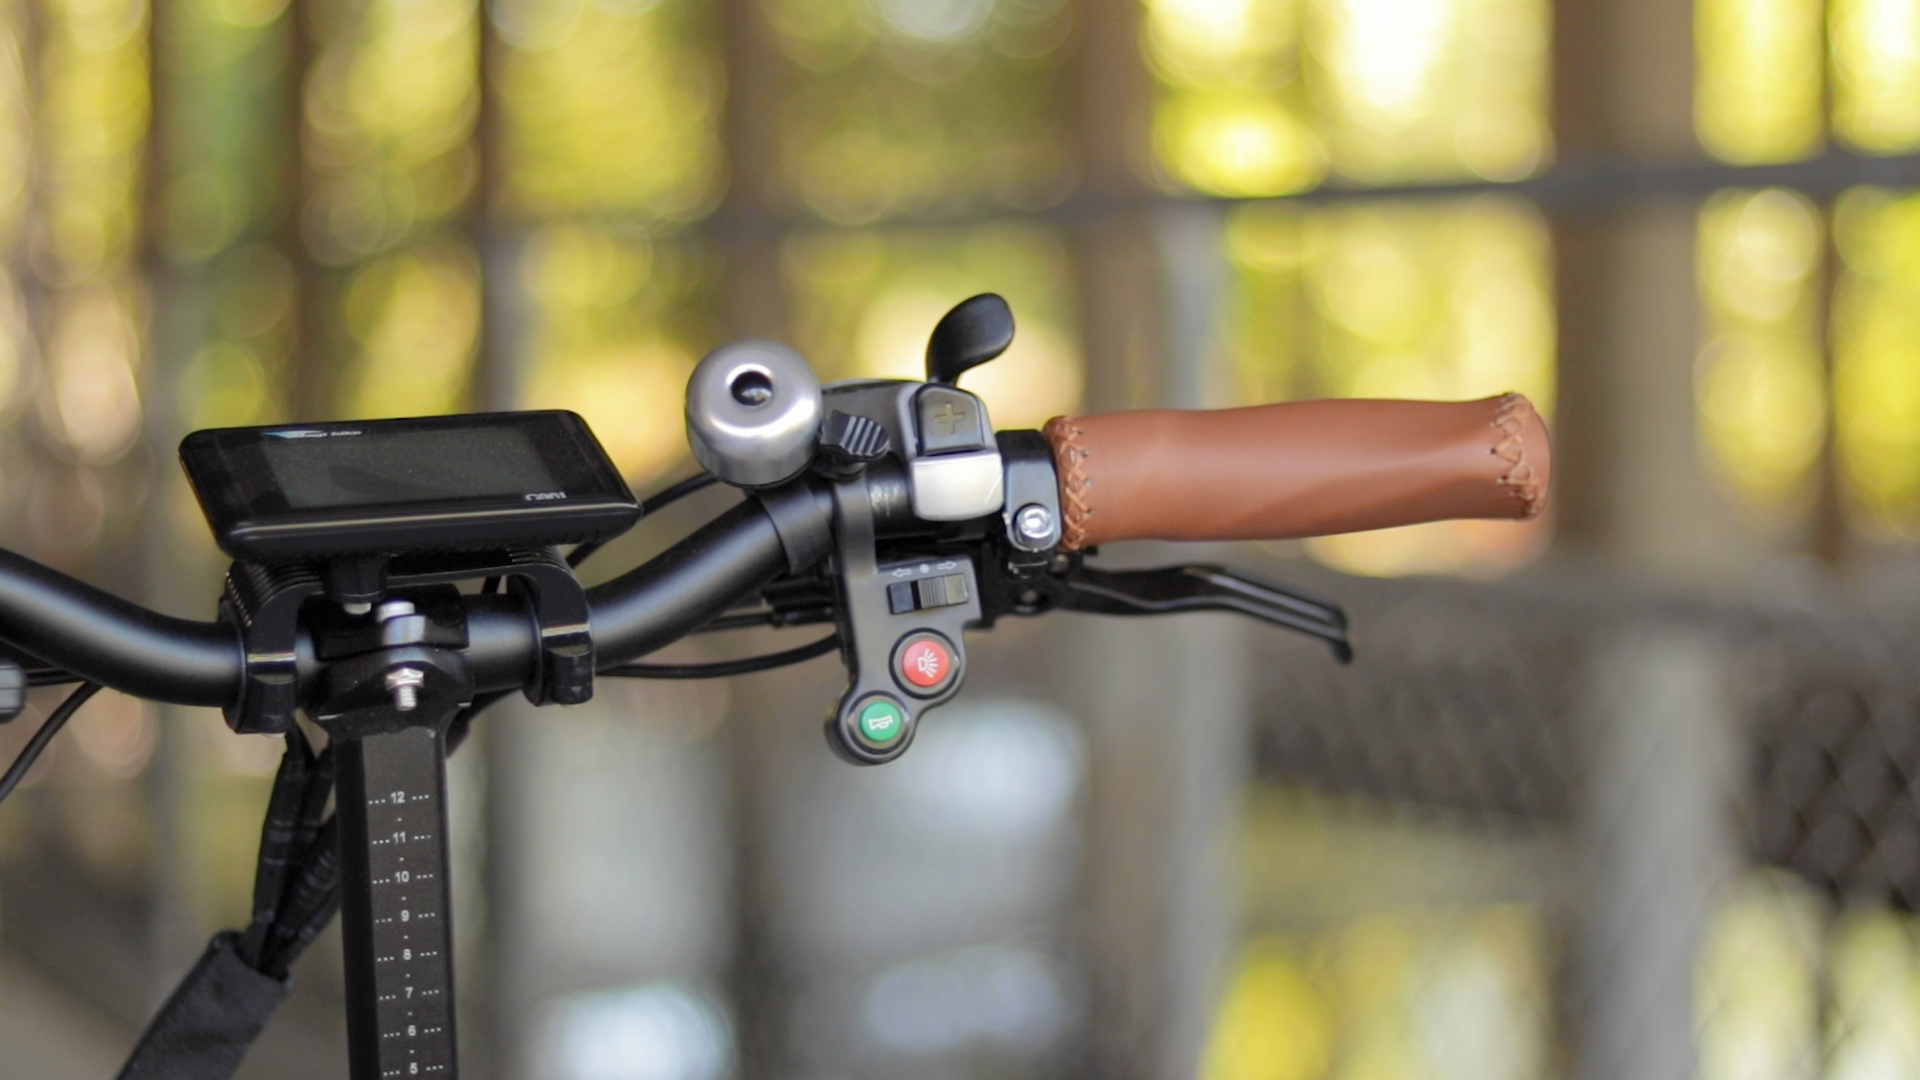 electrified-reviews-bagibike-b10-foldign-electric-bike-review-horn.jpg